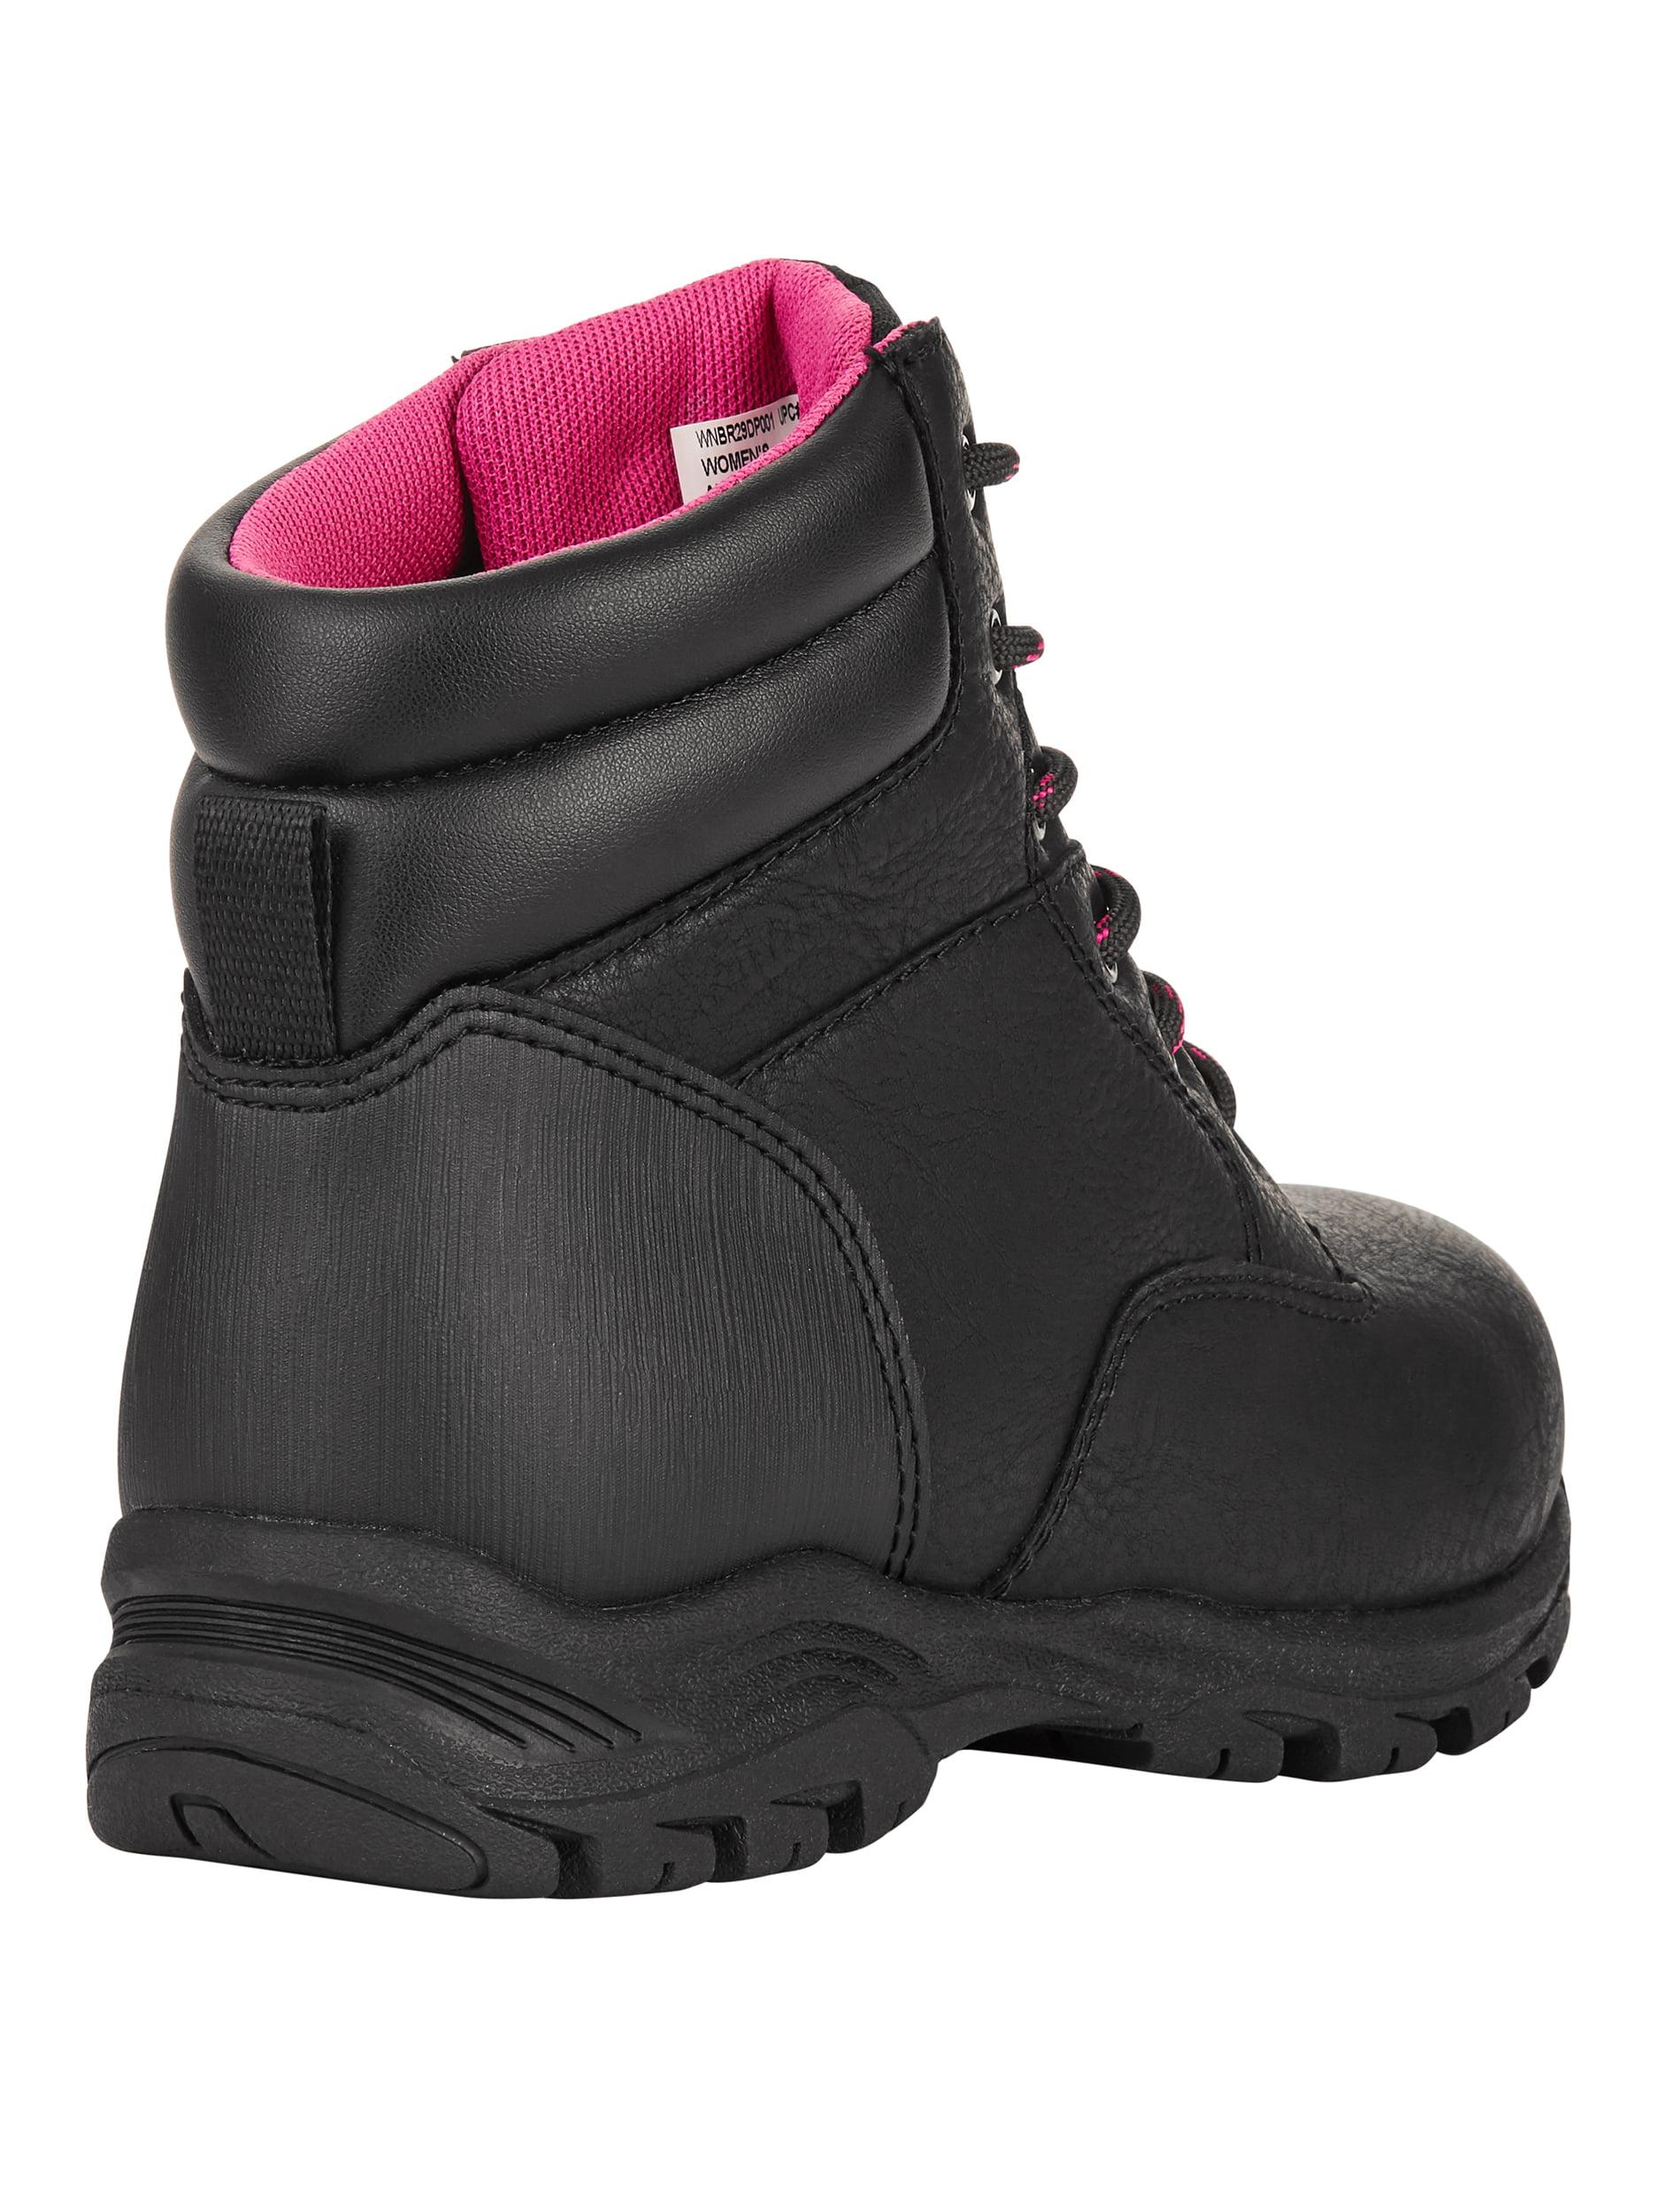 7914bfabad84 BRAHMA - Brahma Women s Bevel Steel Toe Work Boot - Walmart.com